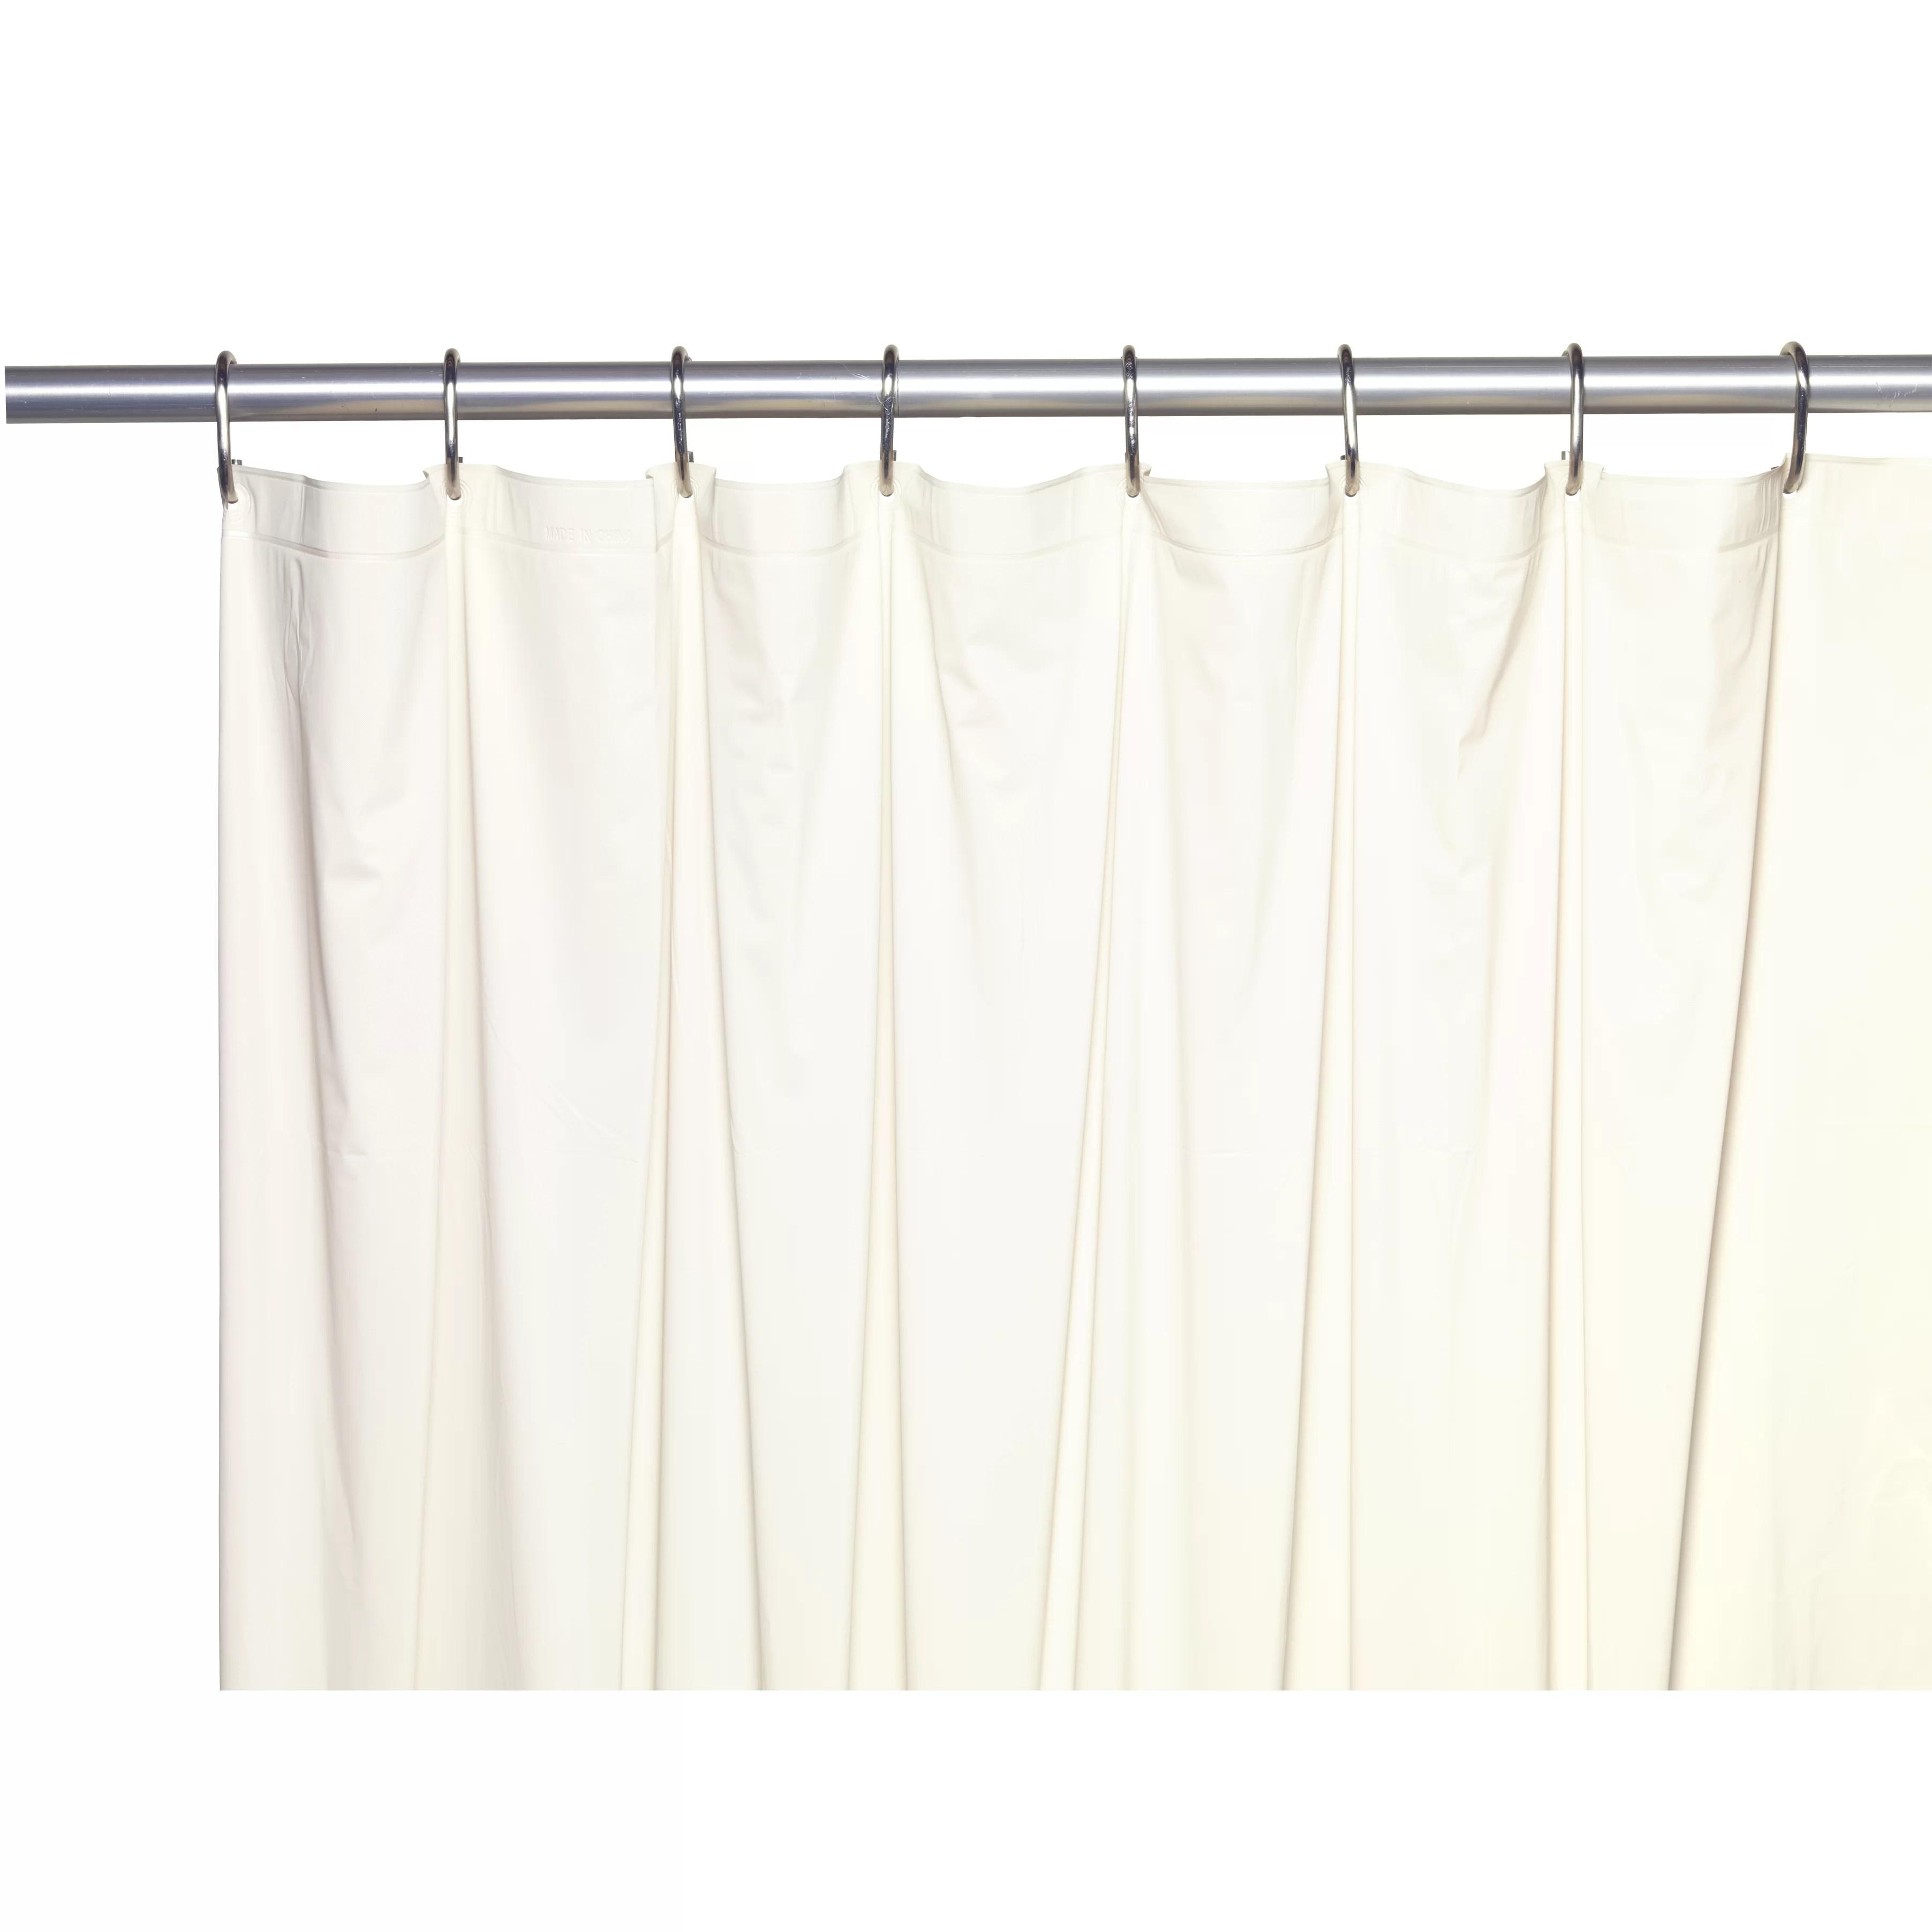 Ben and Jonah Vinyl 5 Gauge Shower Curtain Liner  Wayfair